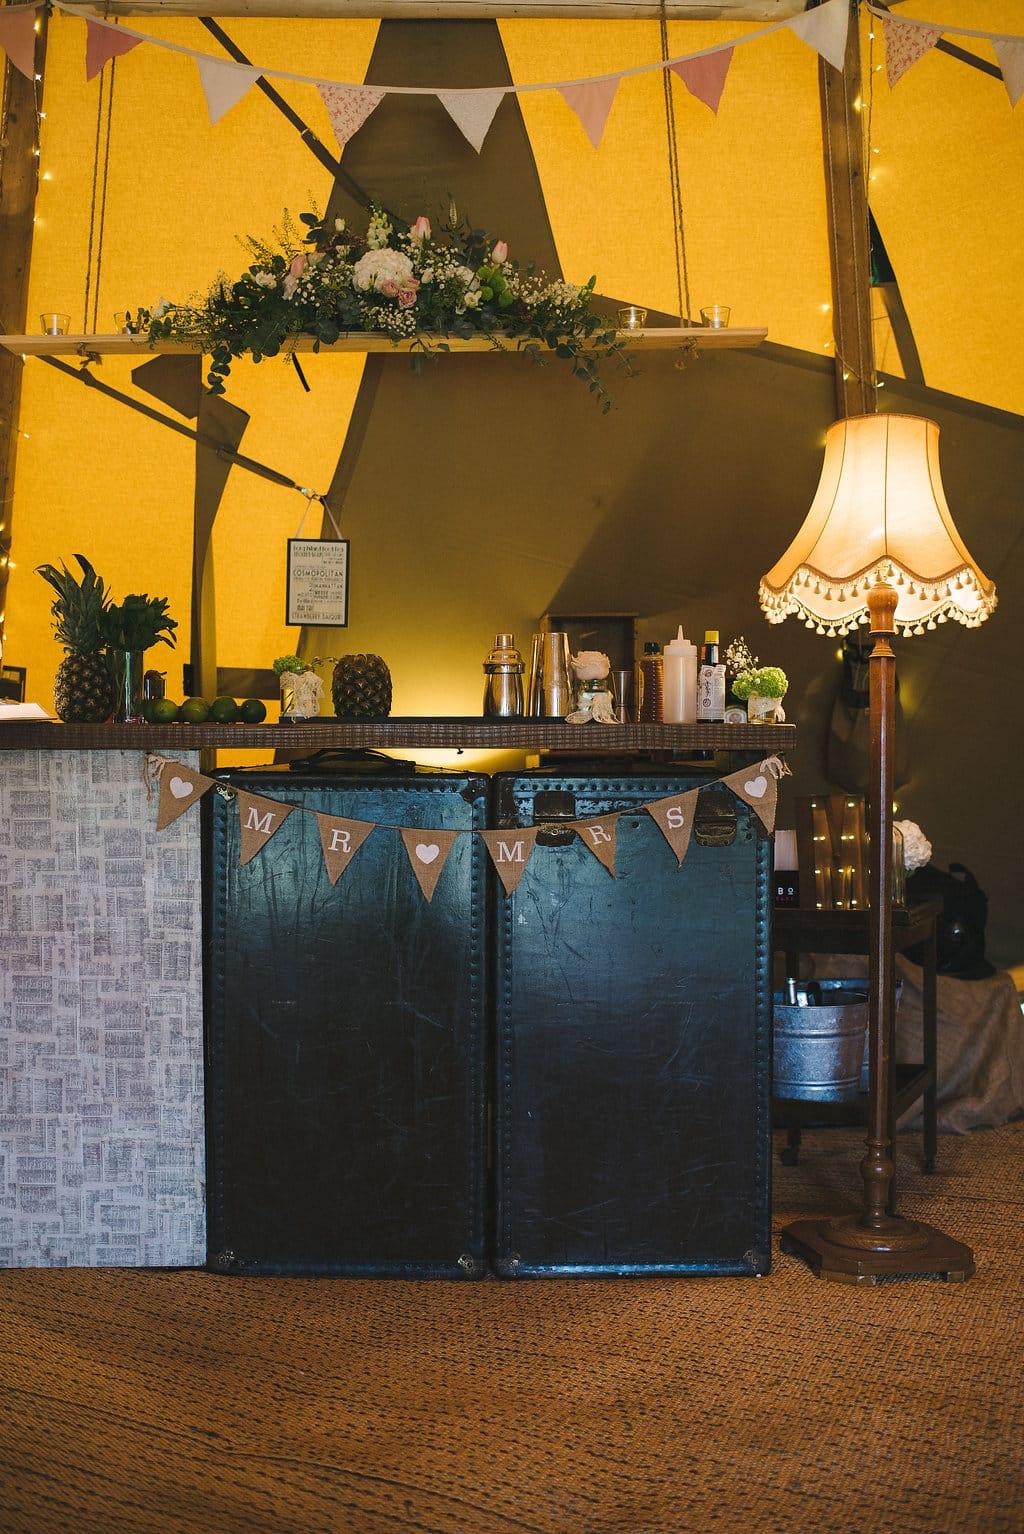 Mambo Mobile Bars Vintage Bar Setup within Tipi